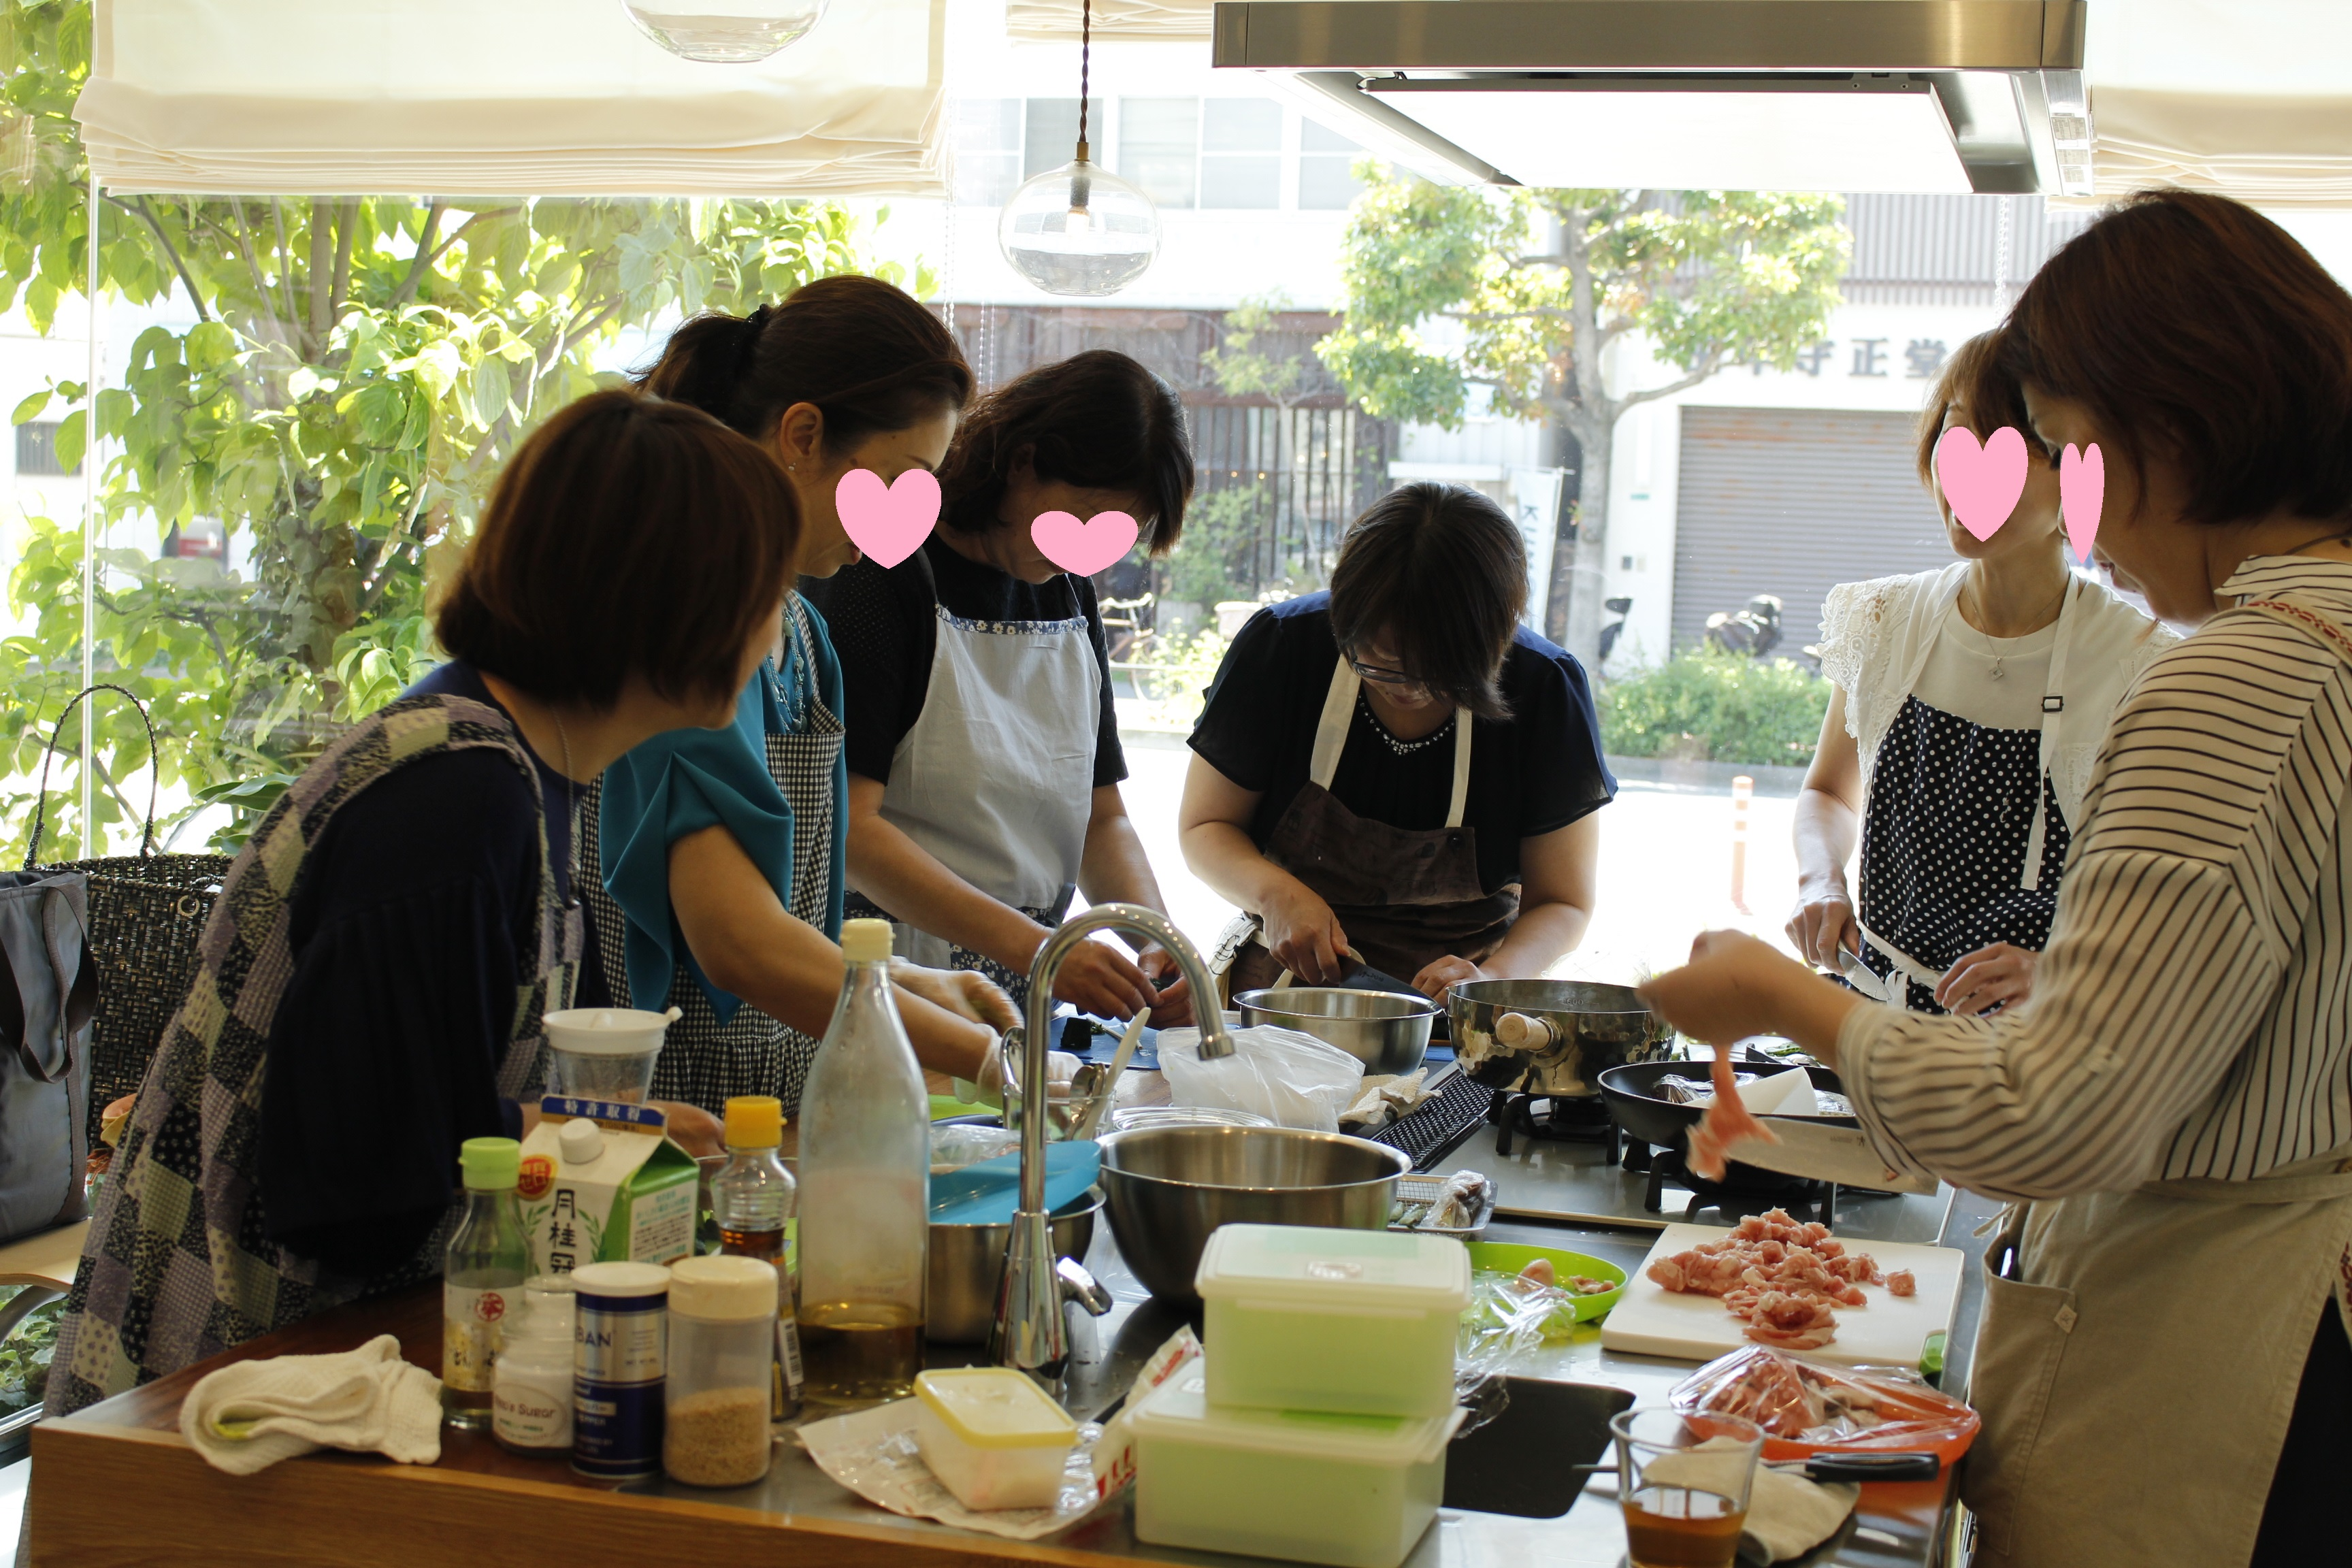 a-ta-sante糖質制限パン料理教室。6月度『糖質制限家庭料理教室』4日間、大盛況で終了。阿倍野区西田辺。